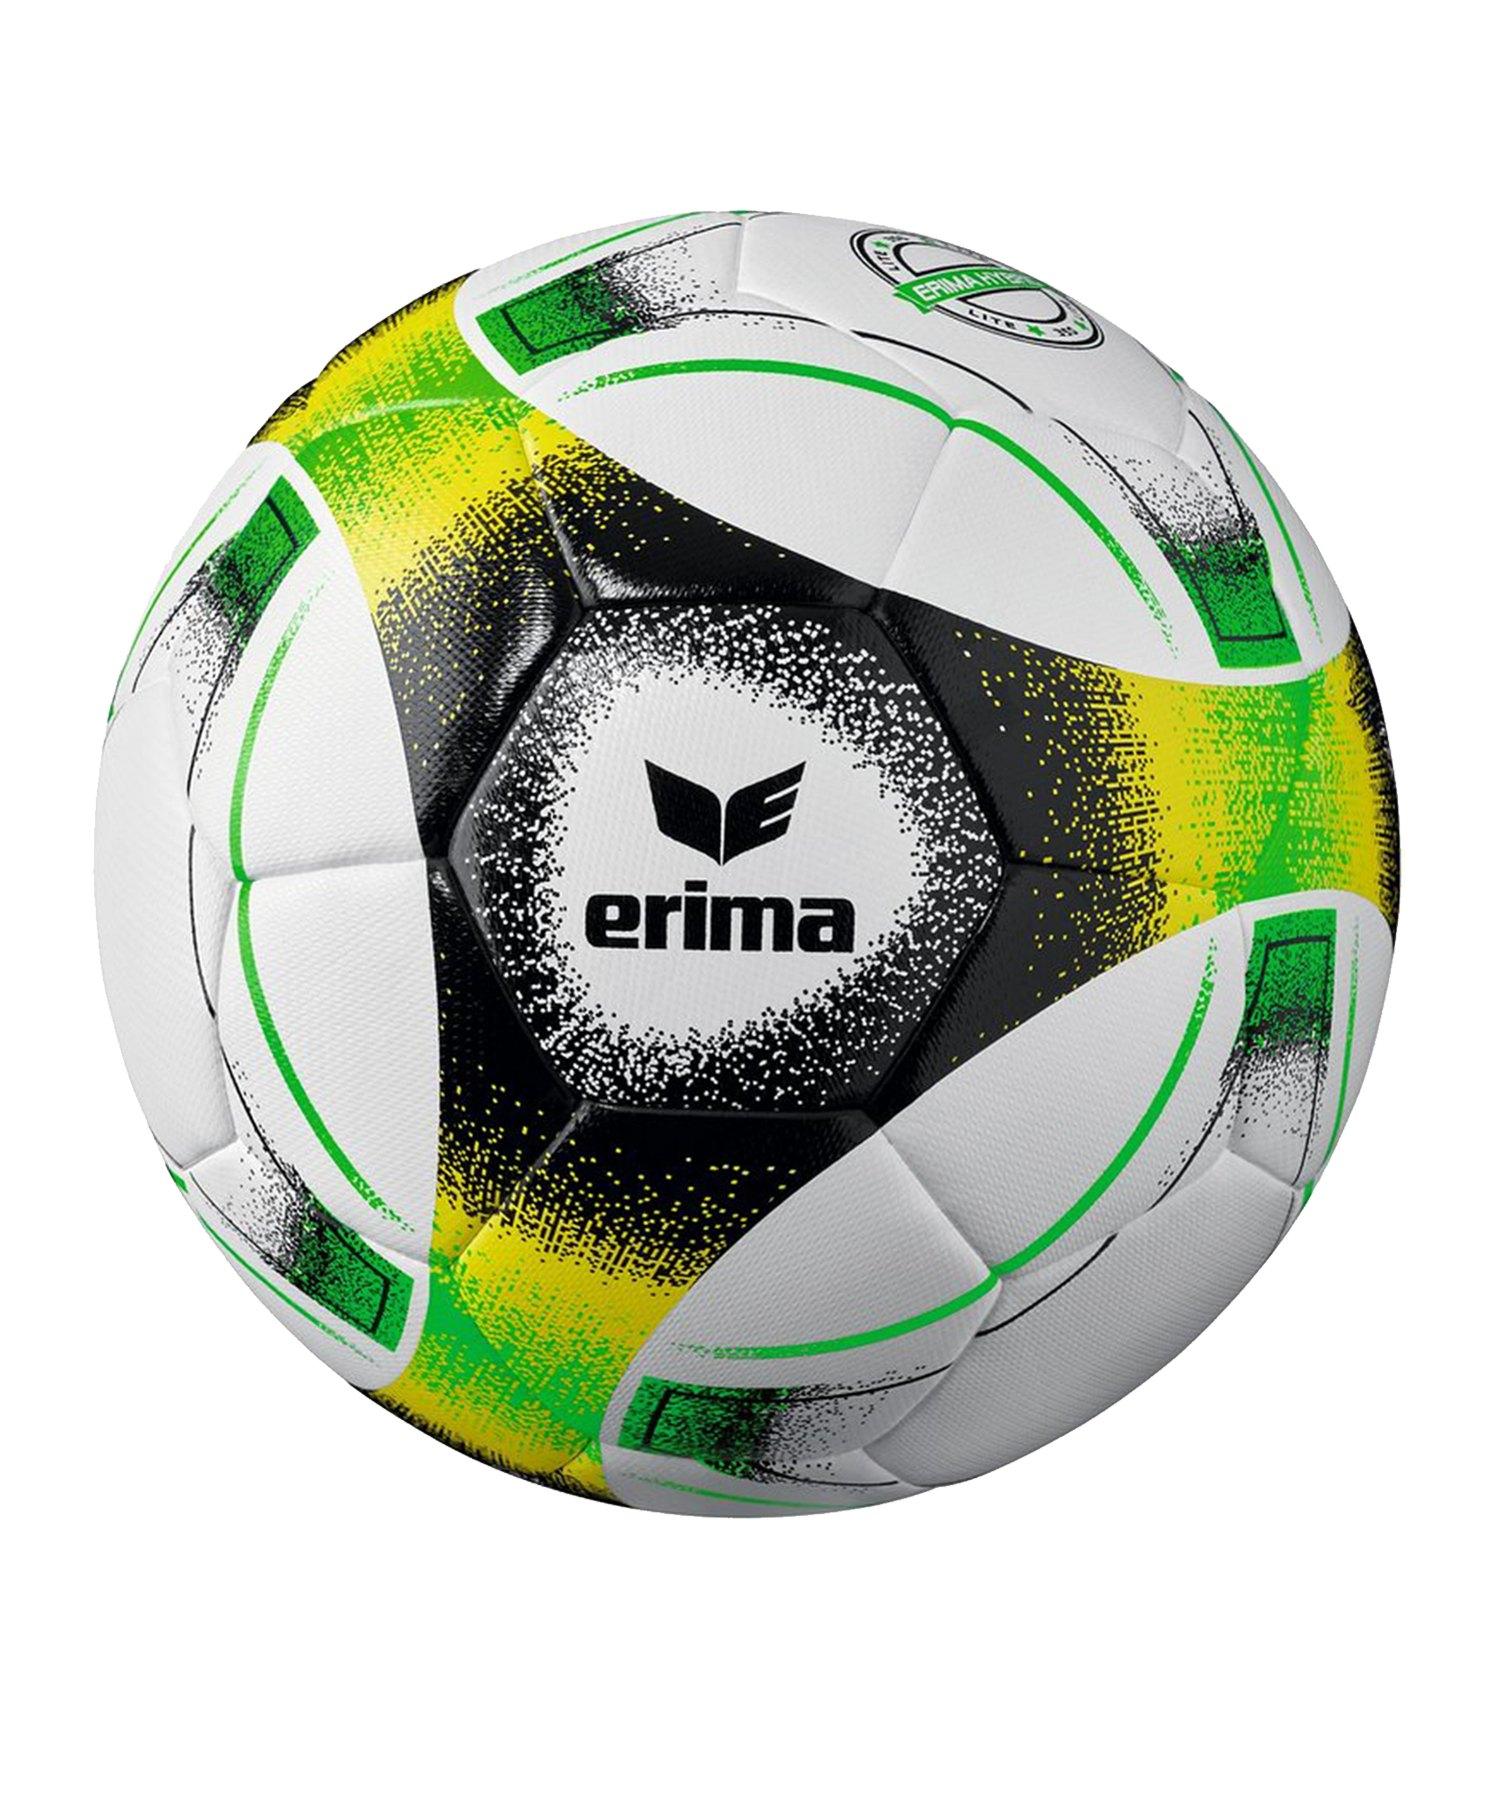 Erima ERIMA Hybrid Lite 350 Grün Schwarz - Gruen